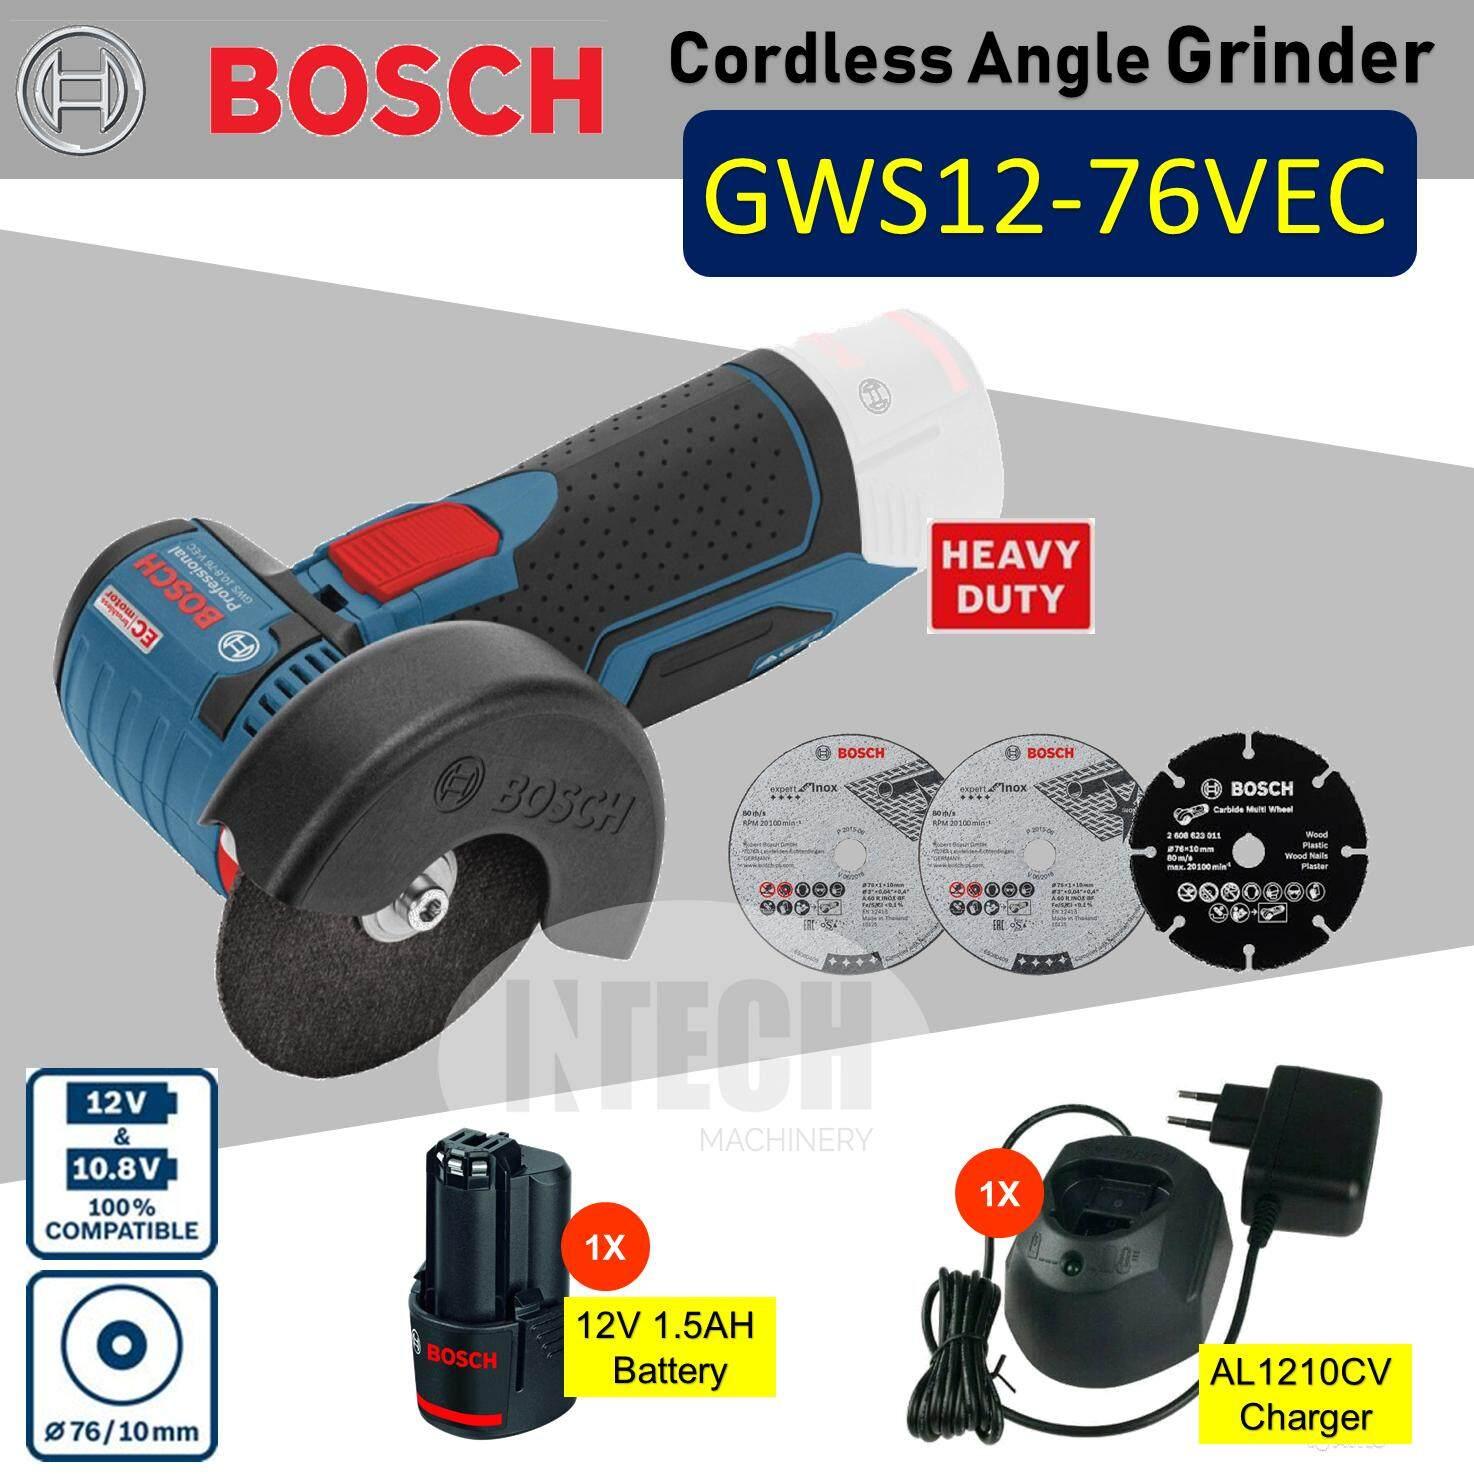 BOSCH GWS12-76V-EC Cordless Angle Grinder + GAL1210CV AND 1No 12V 1.5AH Battery (GWS1276VEC)